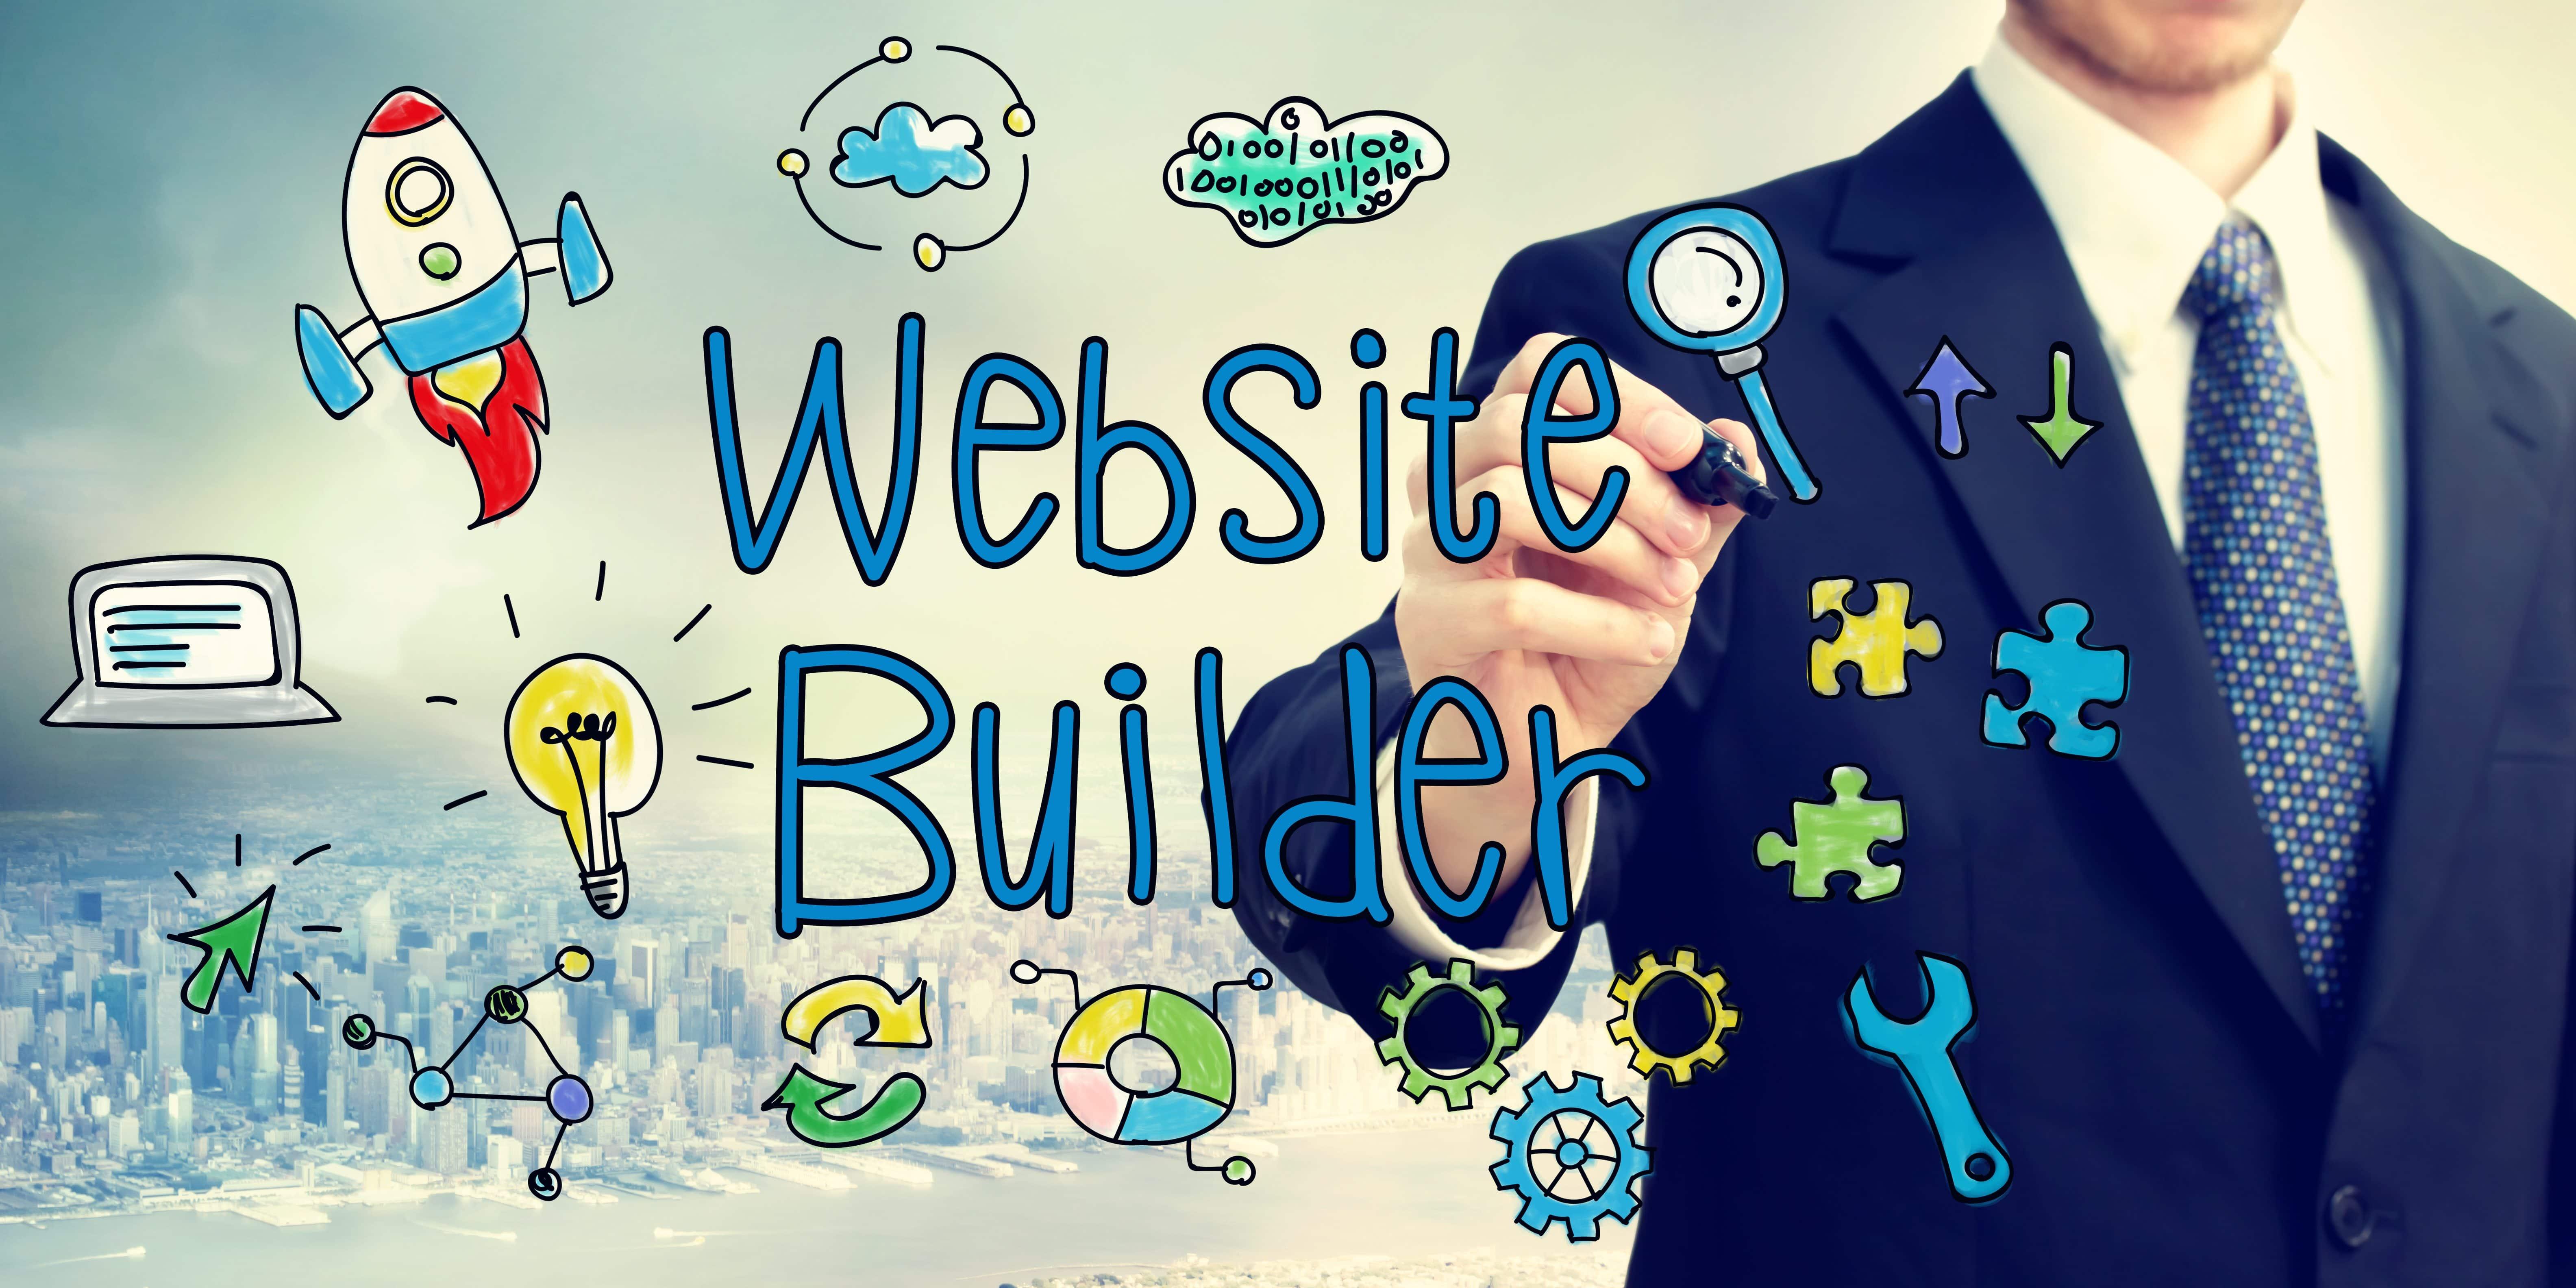 Webpage-builders-in-Bay-City-6336x3168